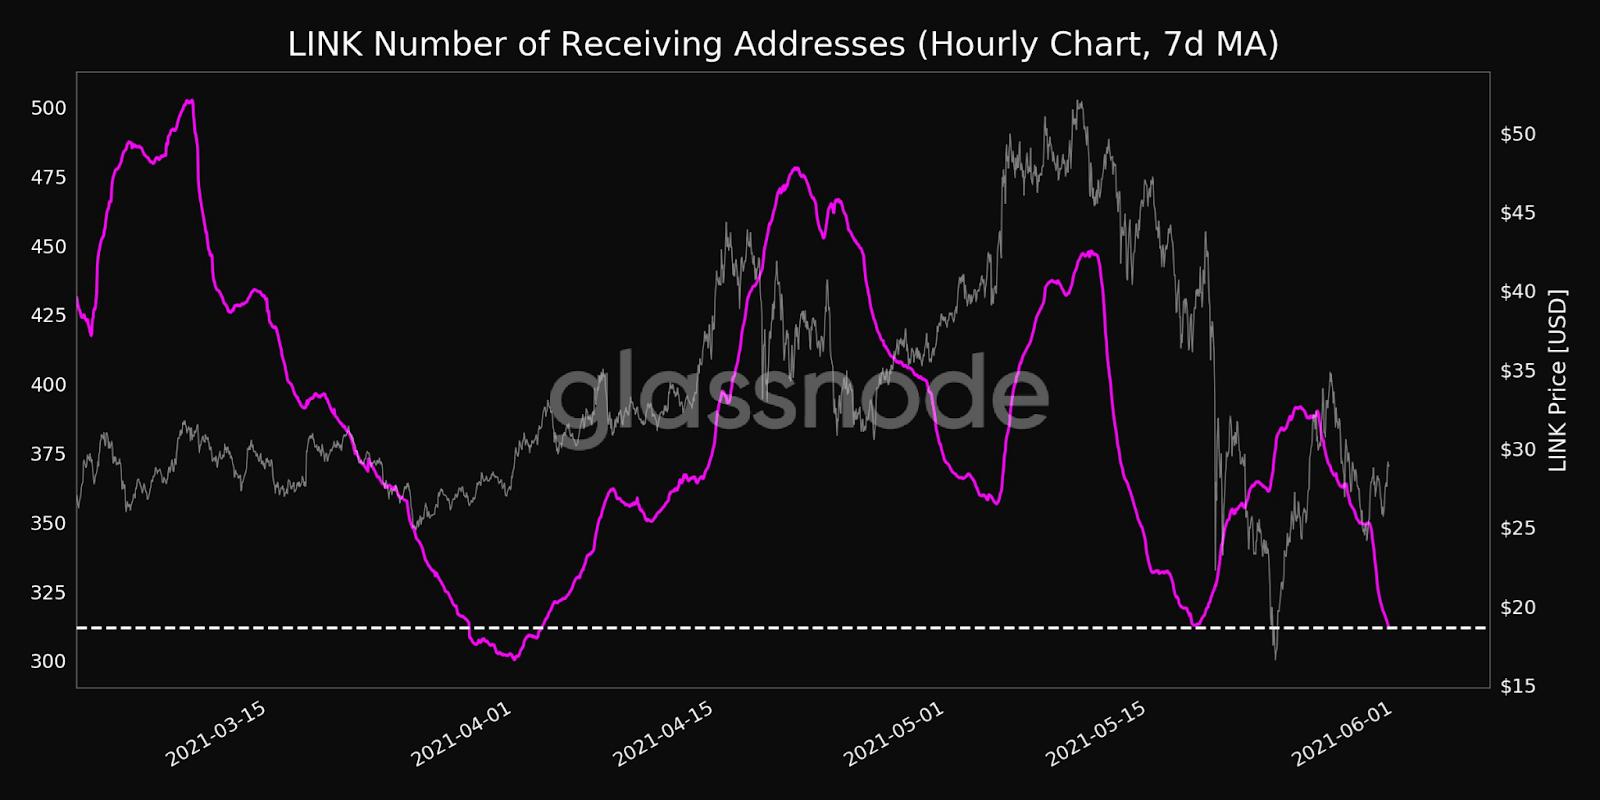 LINK Number of Receiving Addresses